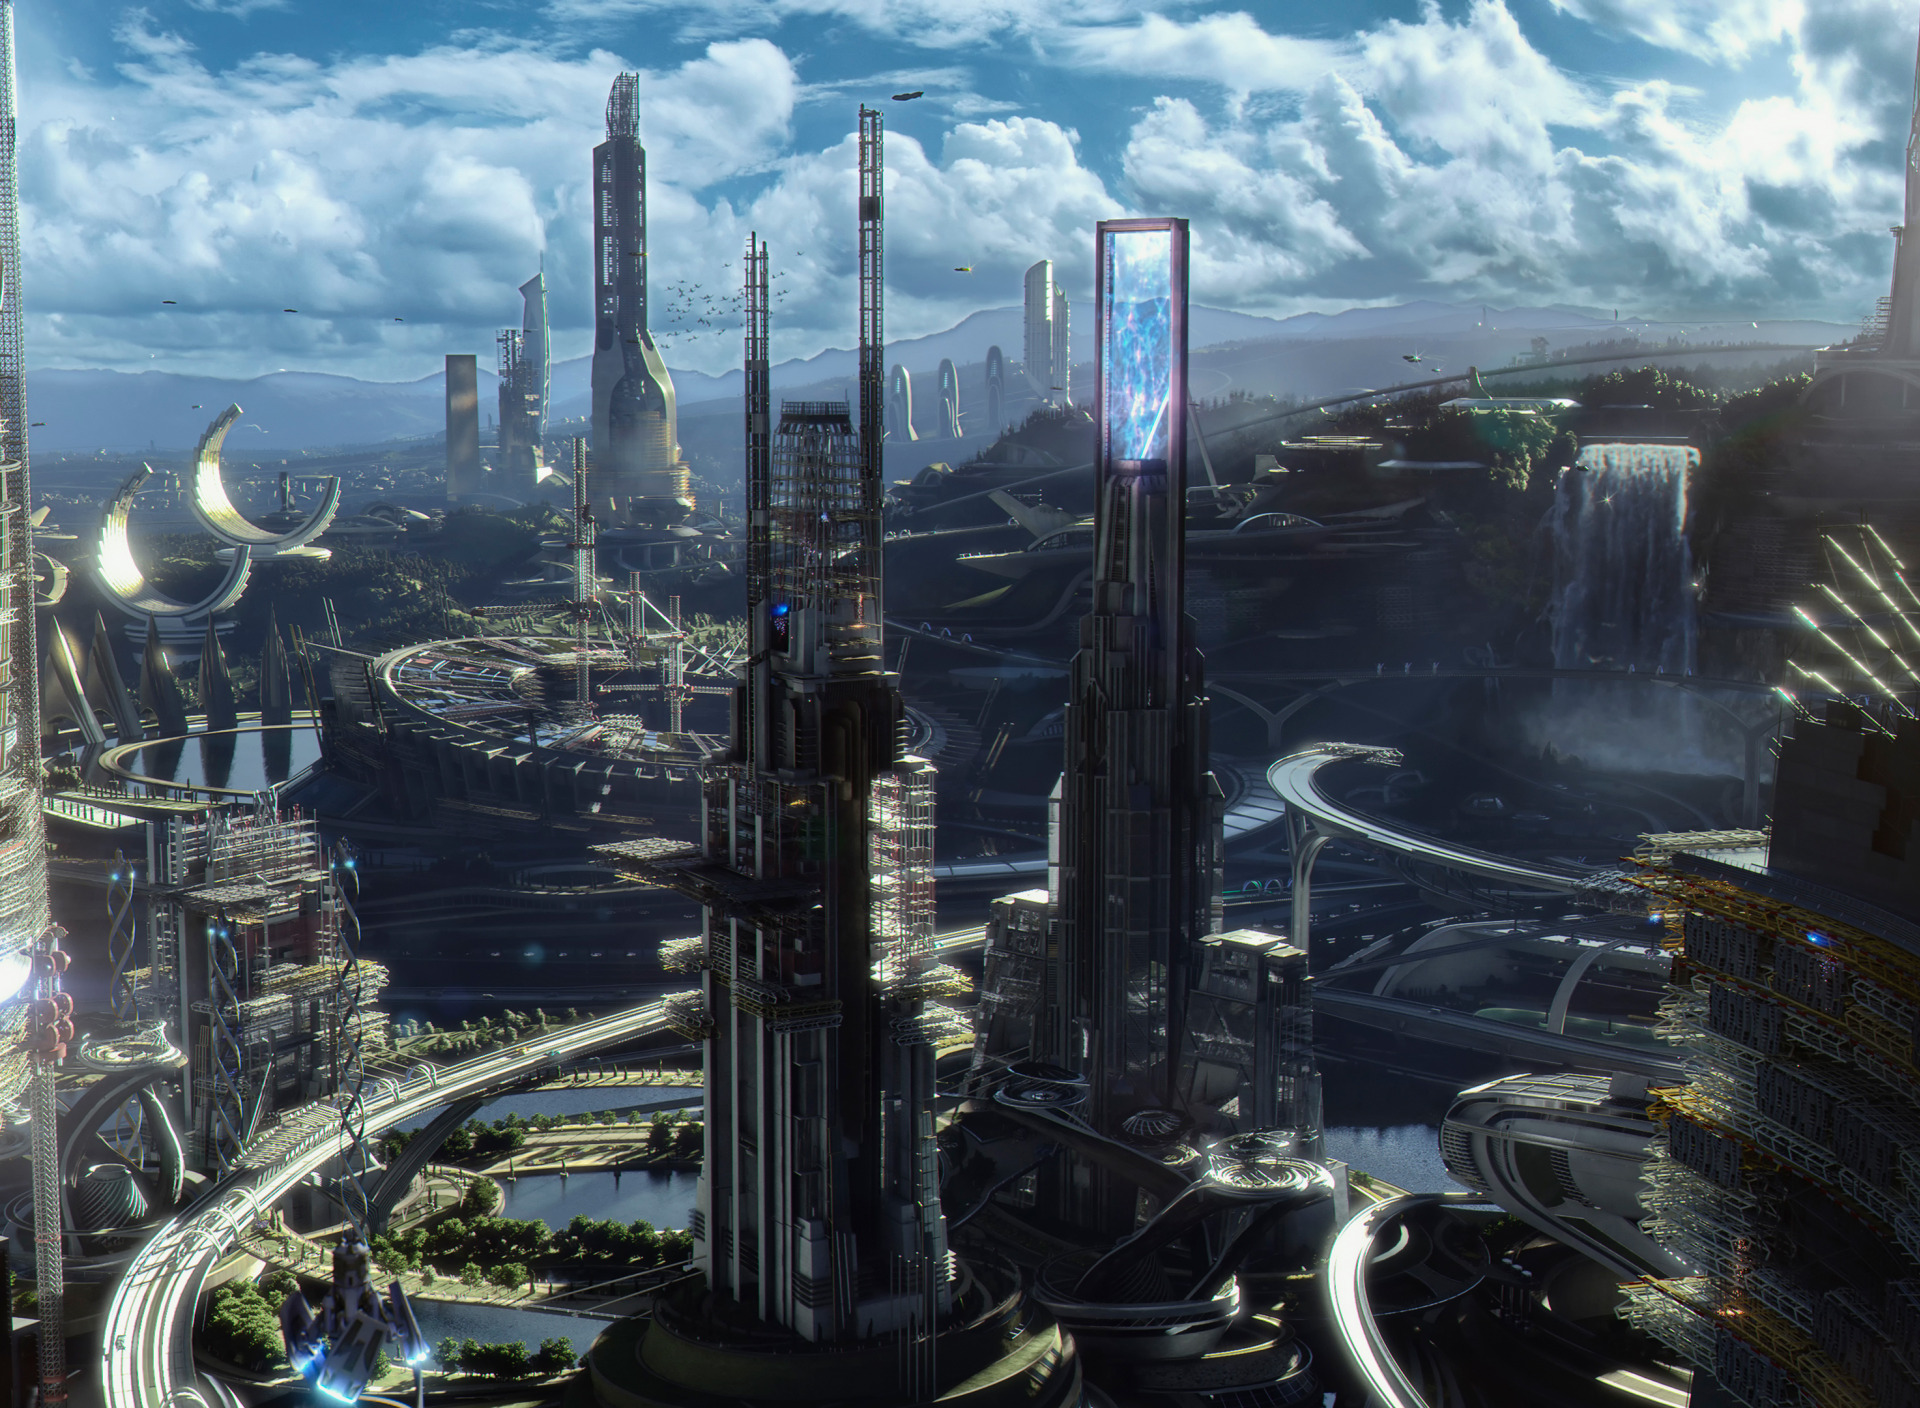 картинки про будущее мира завода